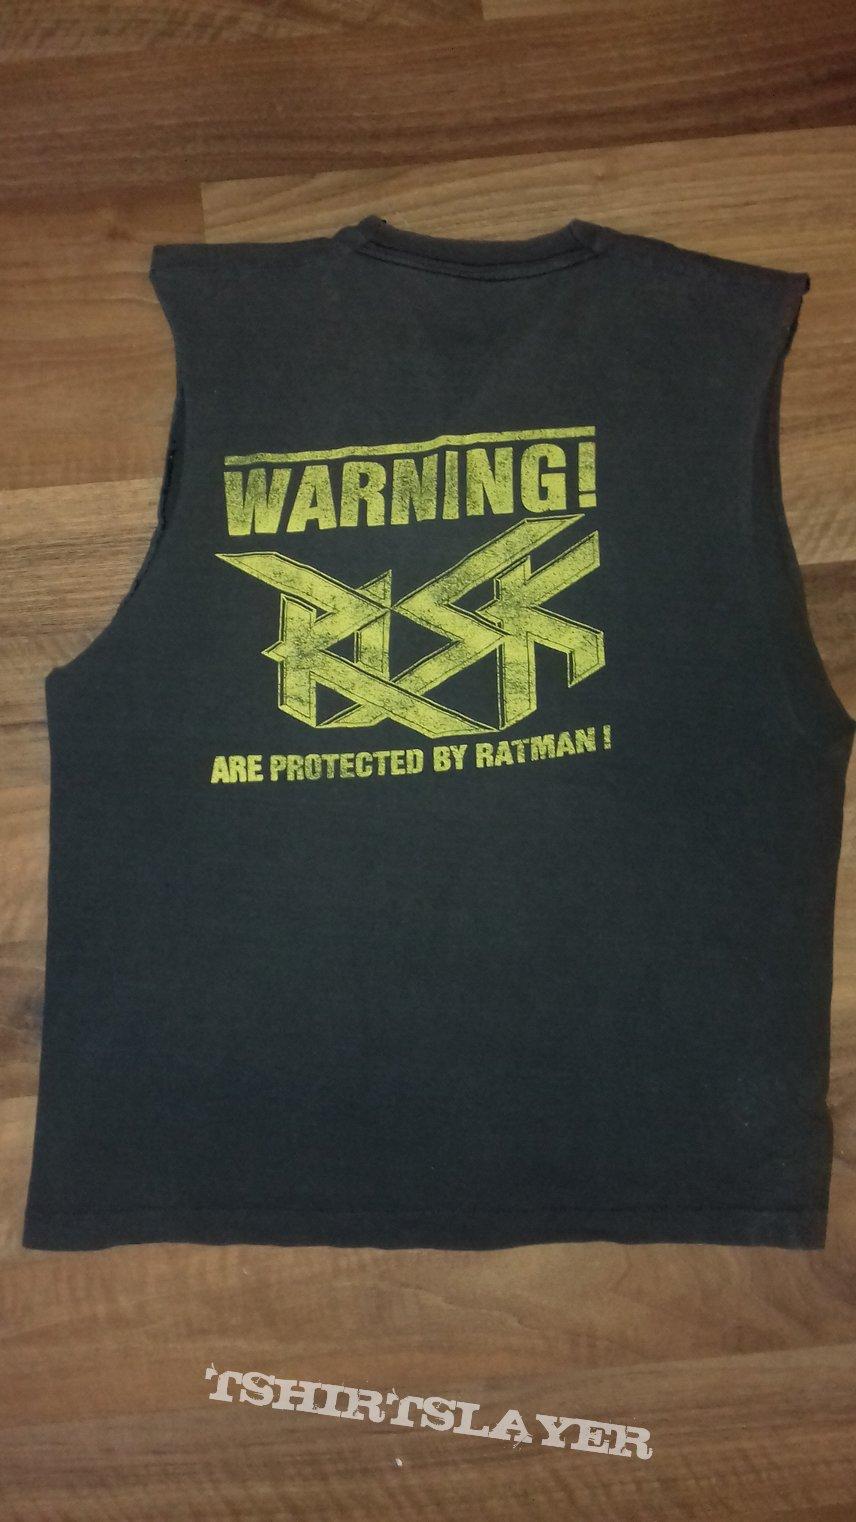 Original 1989 Risk - Ratman shirt